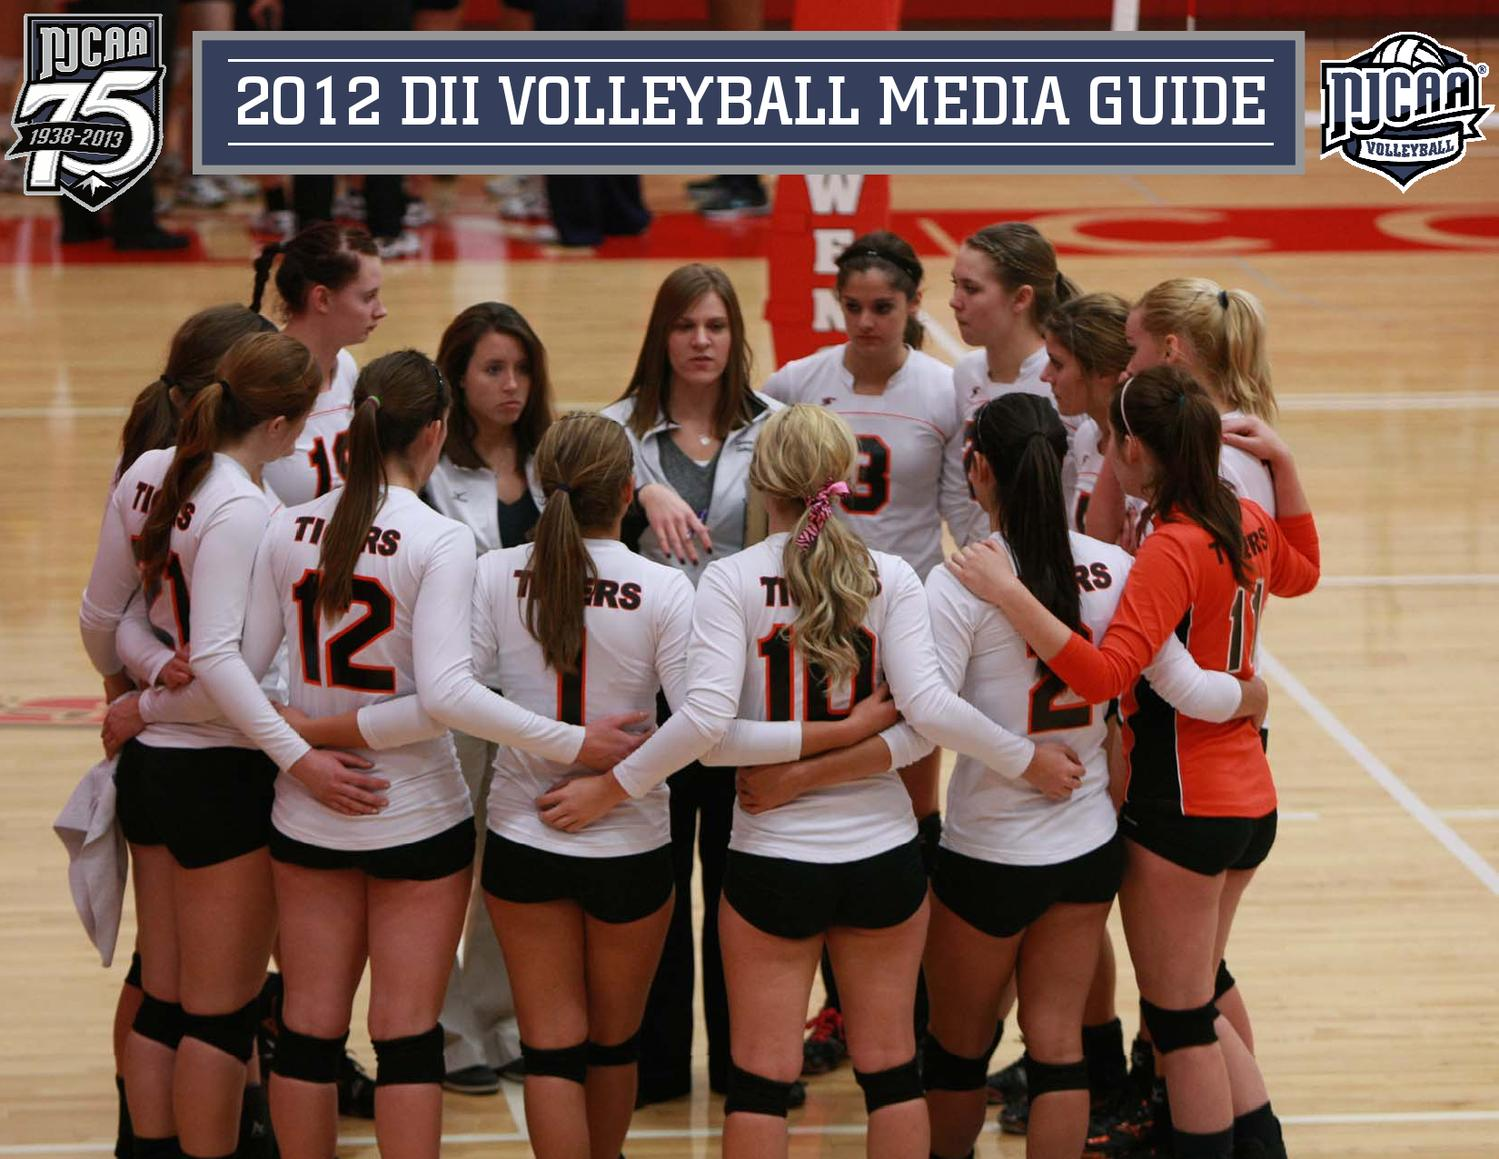 2012 Njcaa Dii Volleyball Media Guide By Mark Krug Issuu